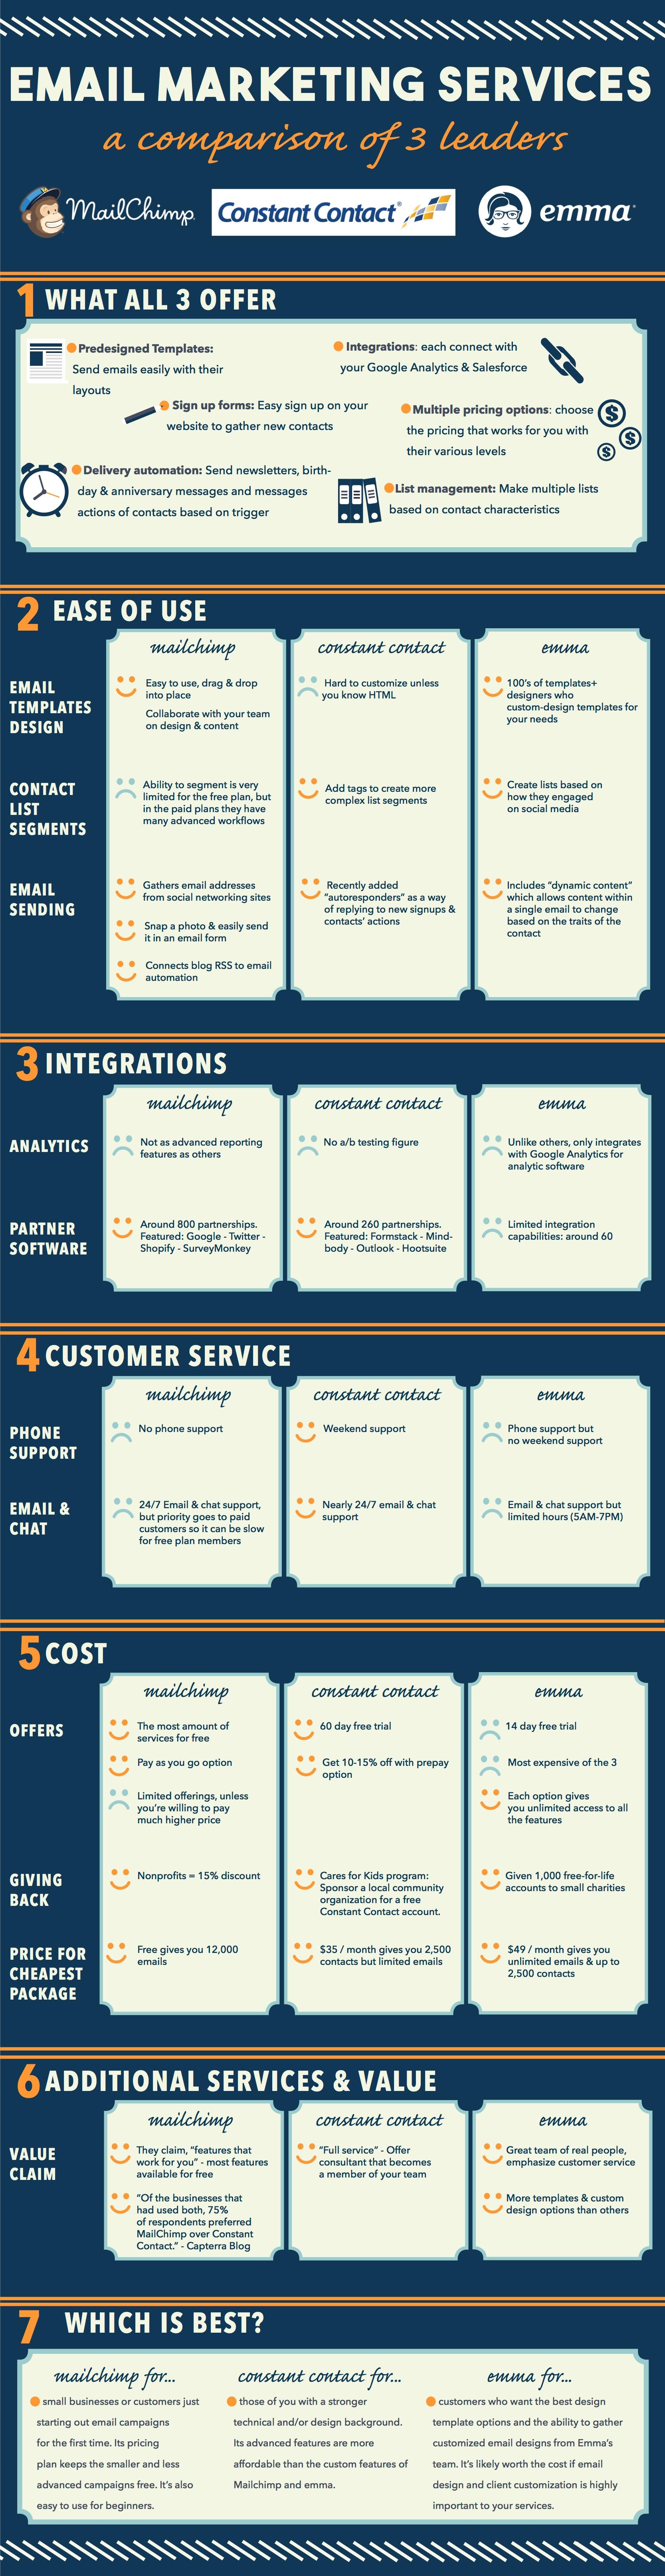 mailchimp-vs-constant_contact-vs-emma-infographic